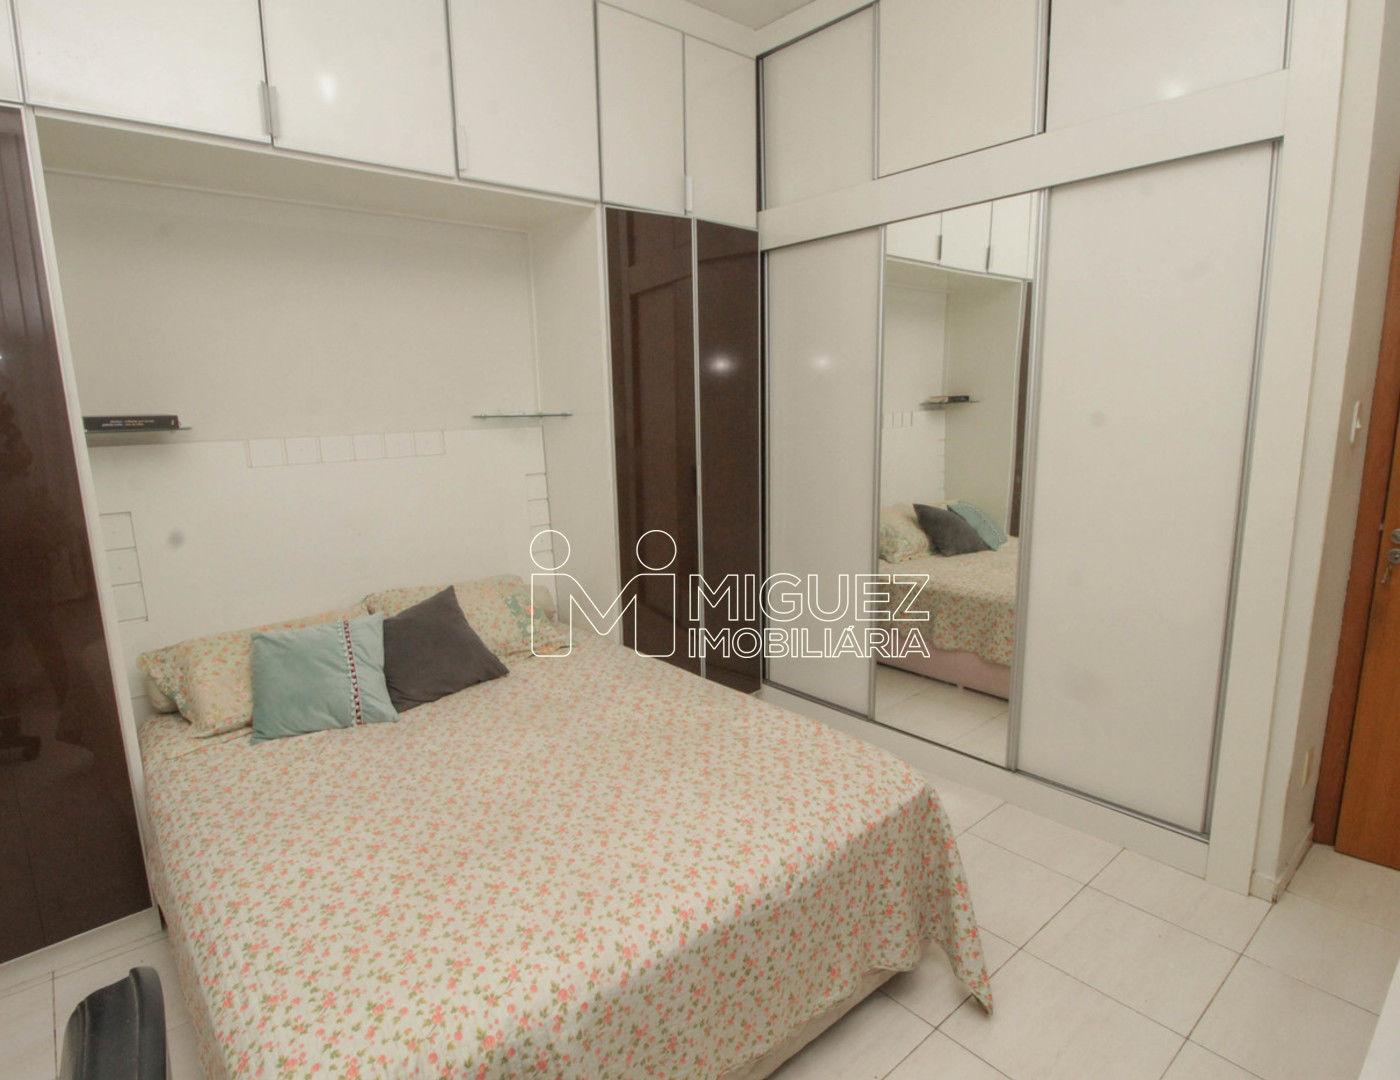 Casa, venda, Rua Dona Zulmira - Tijuca , Rio de janeiro